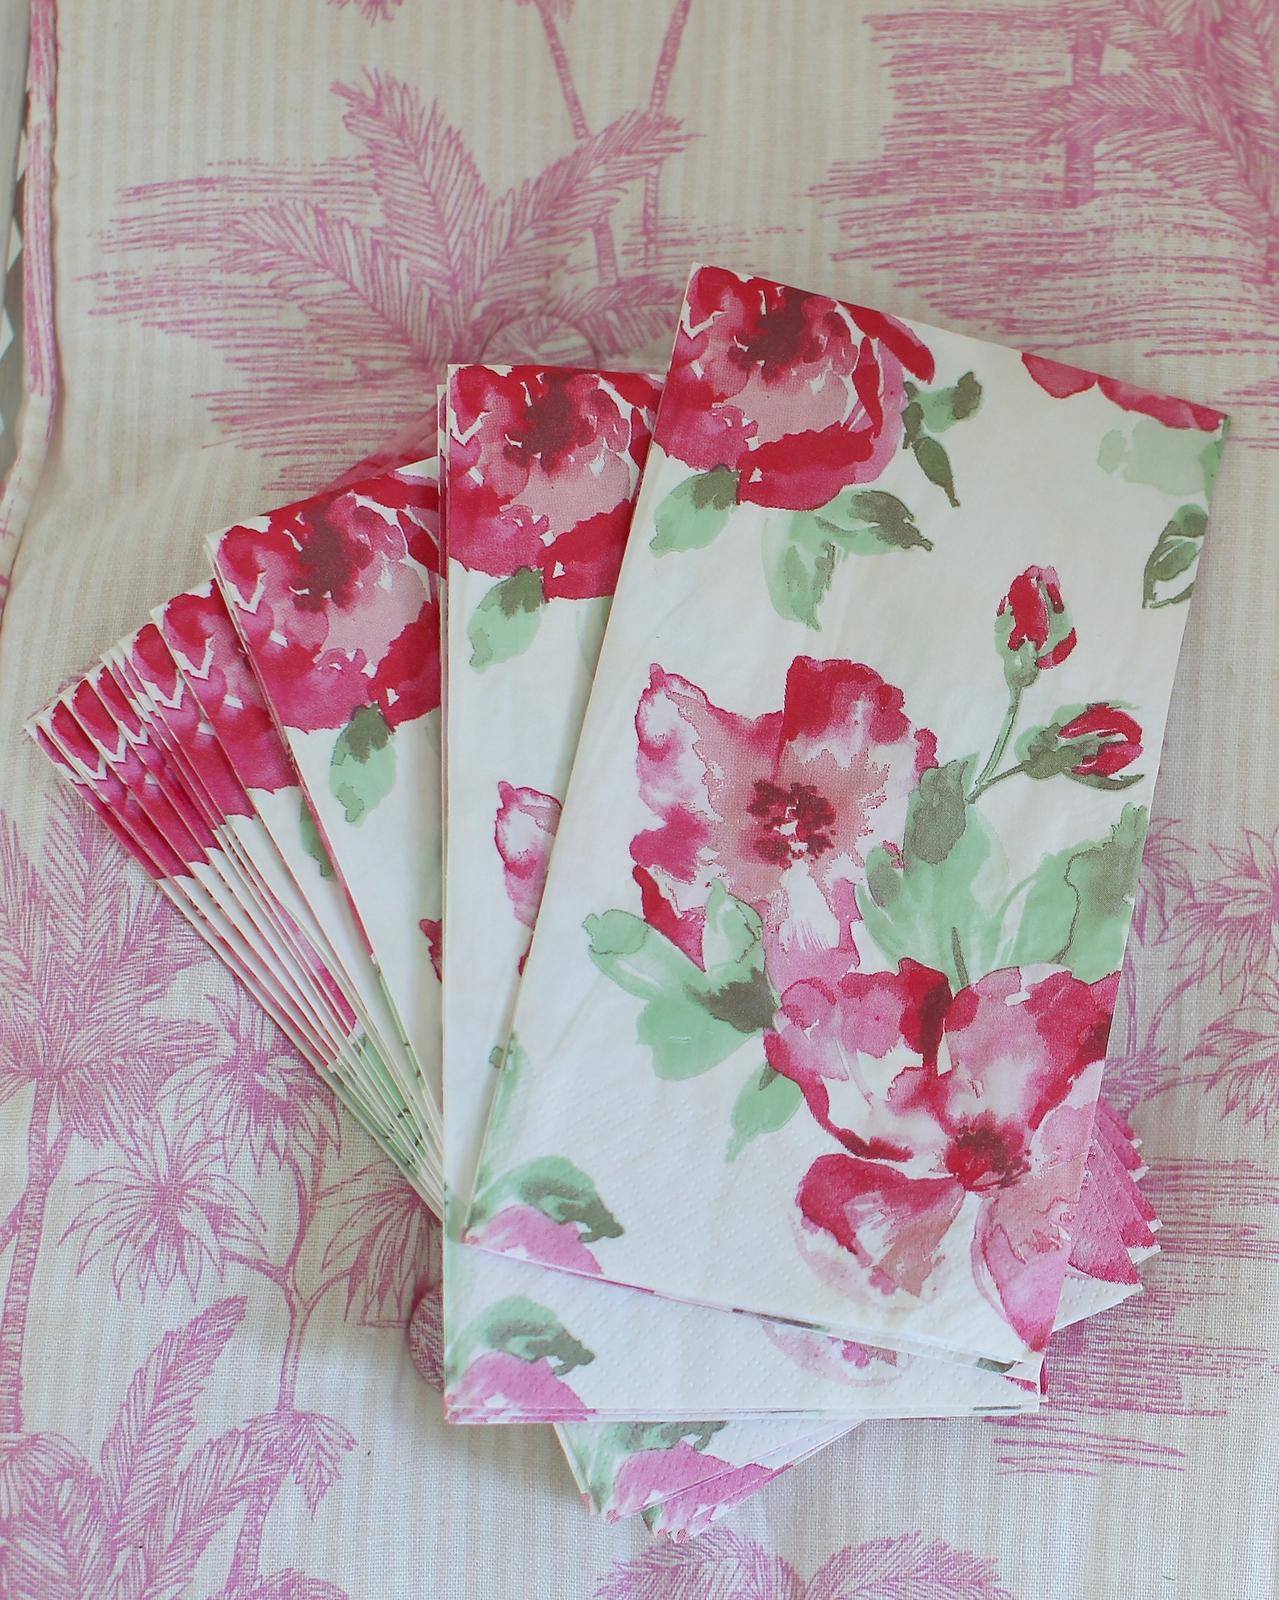 geri-hirsch-bridal-shower-tea-party-napkins-0315.jpg